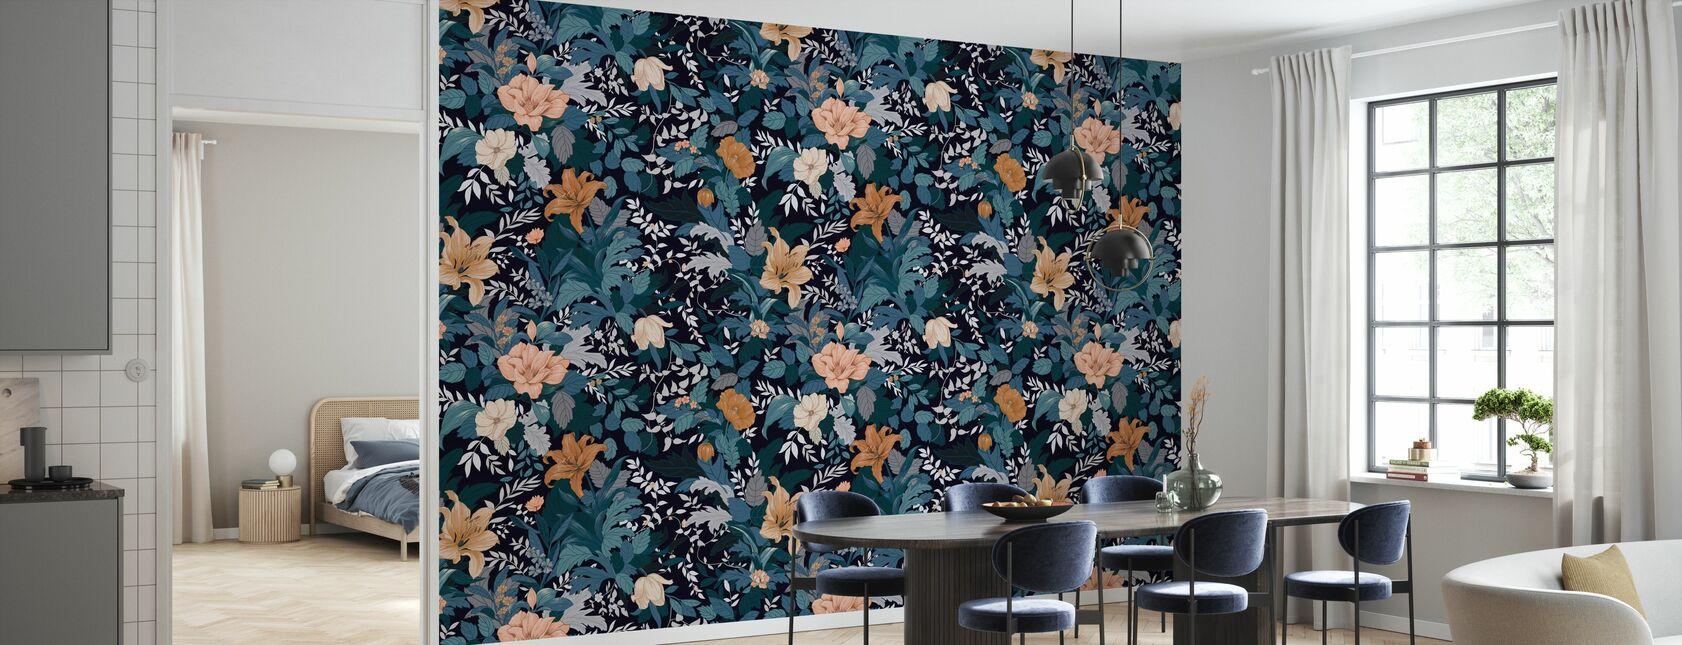 Allure - Something Borrowed - Wallpaper - Kitchen